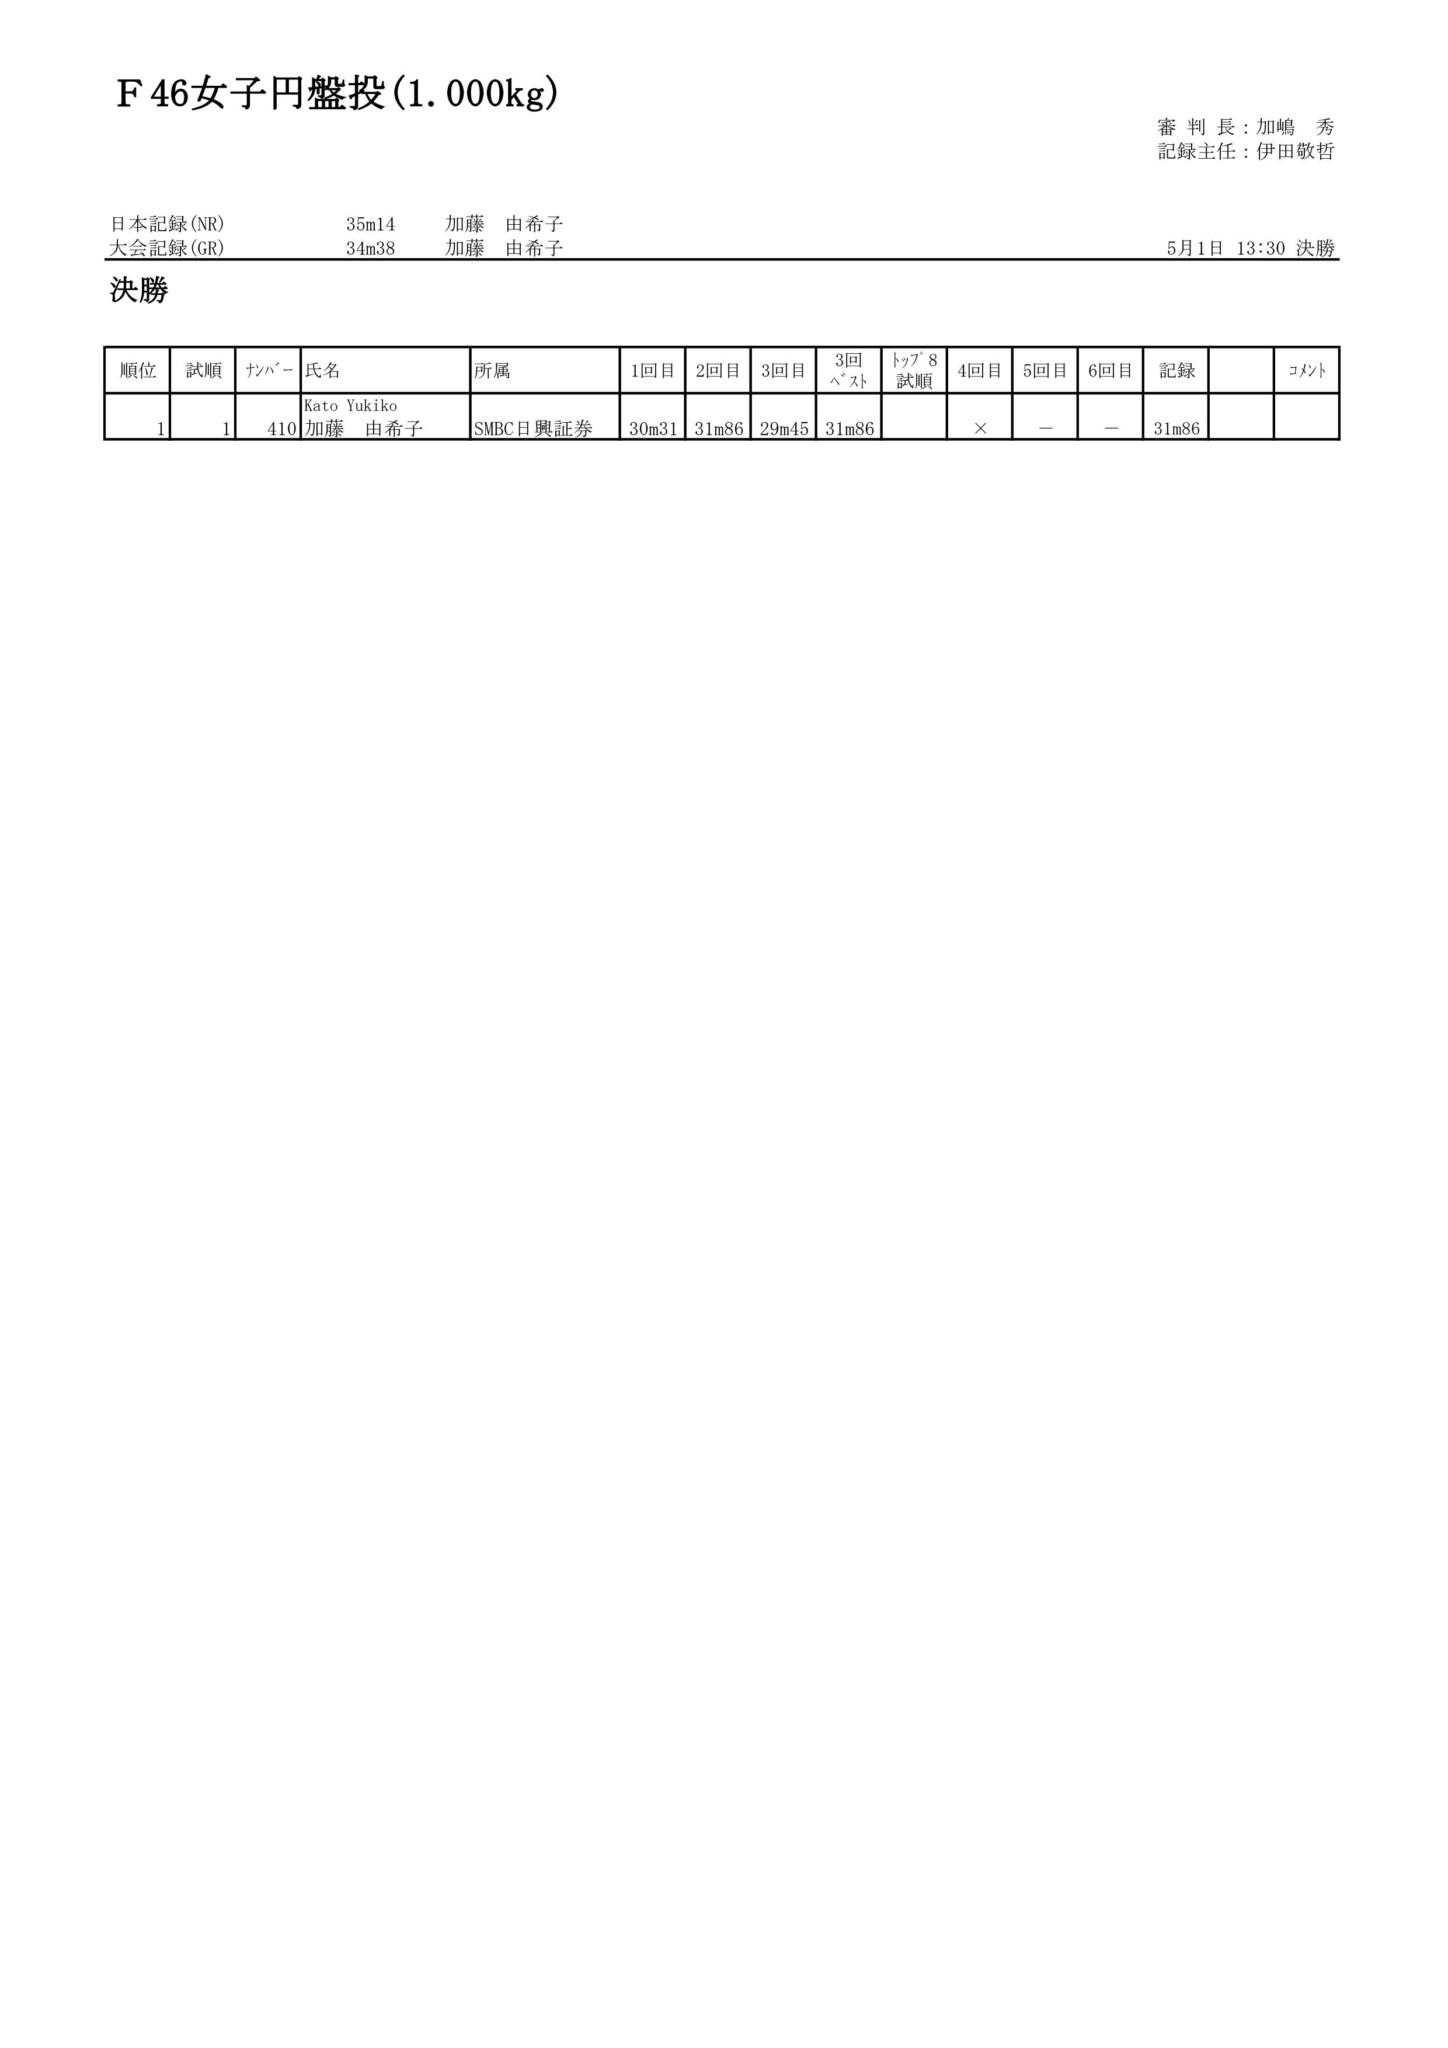 65F46女子円盤投(1.000kg)_01